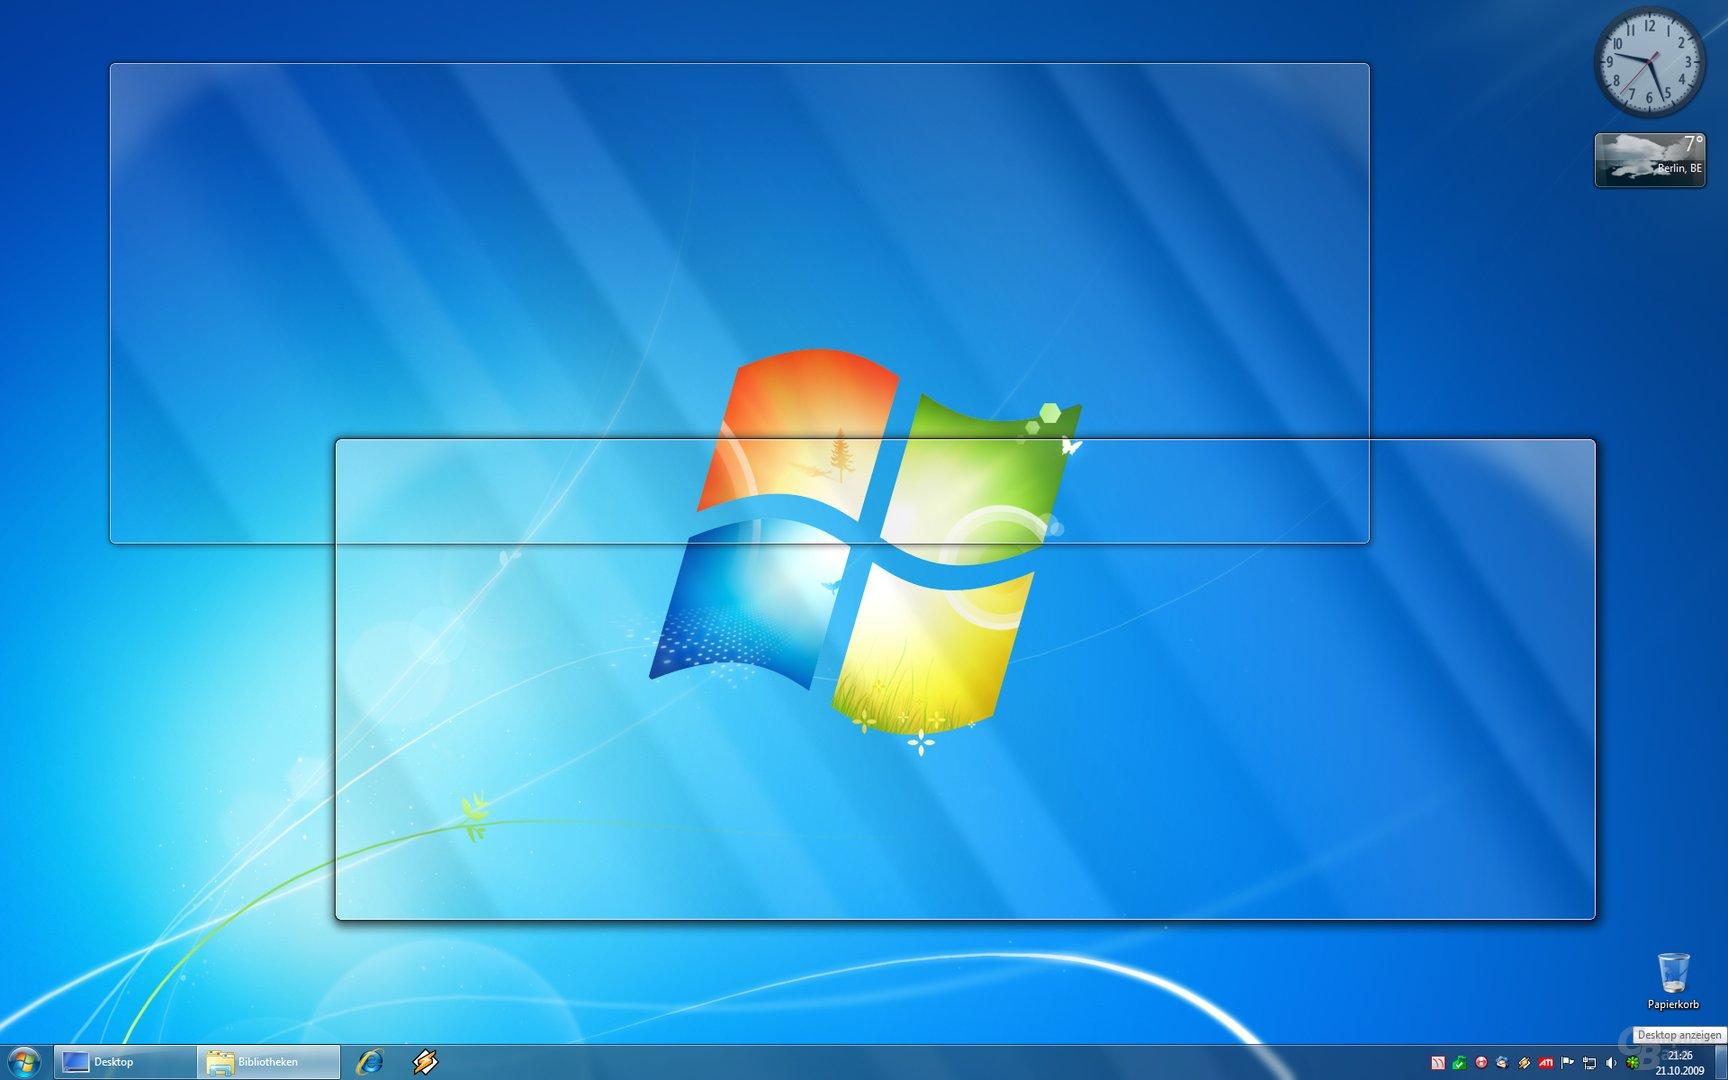 Desktop anzeigen per Aero Peek (rechte untere Ecke)